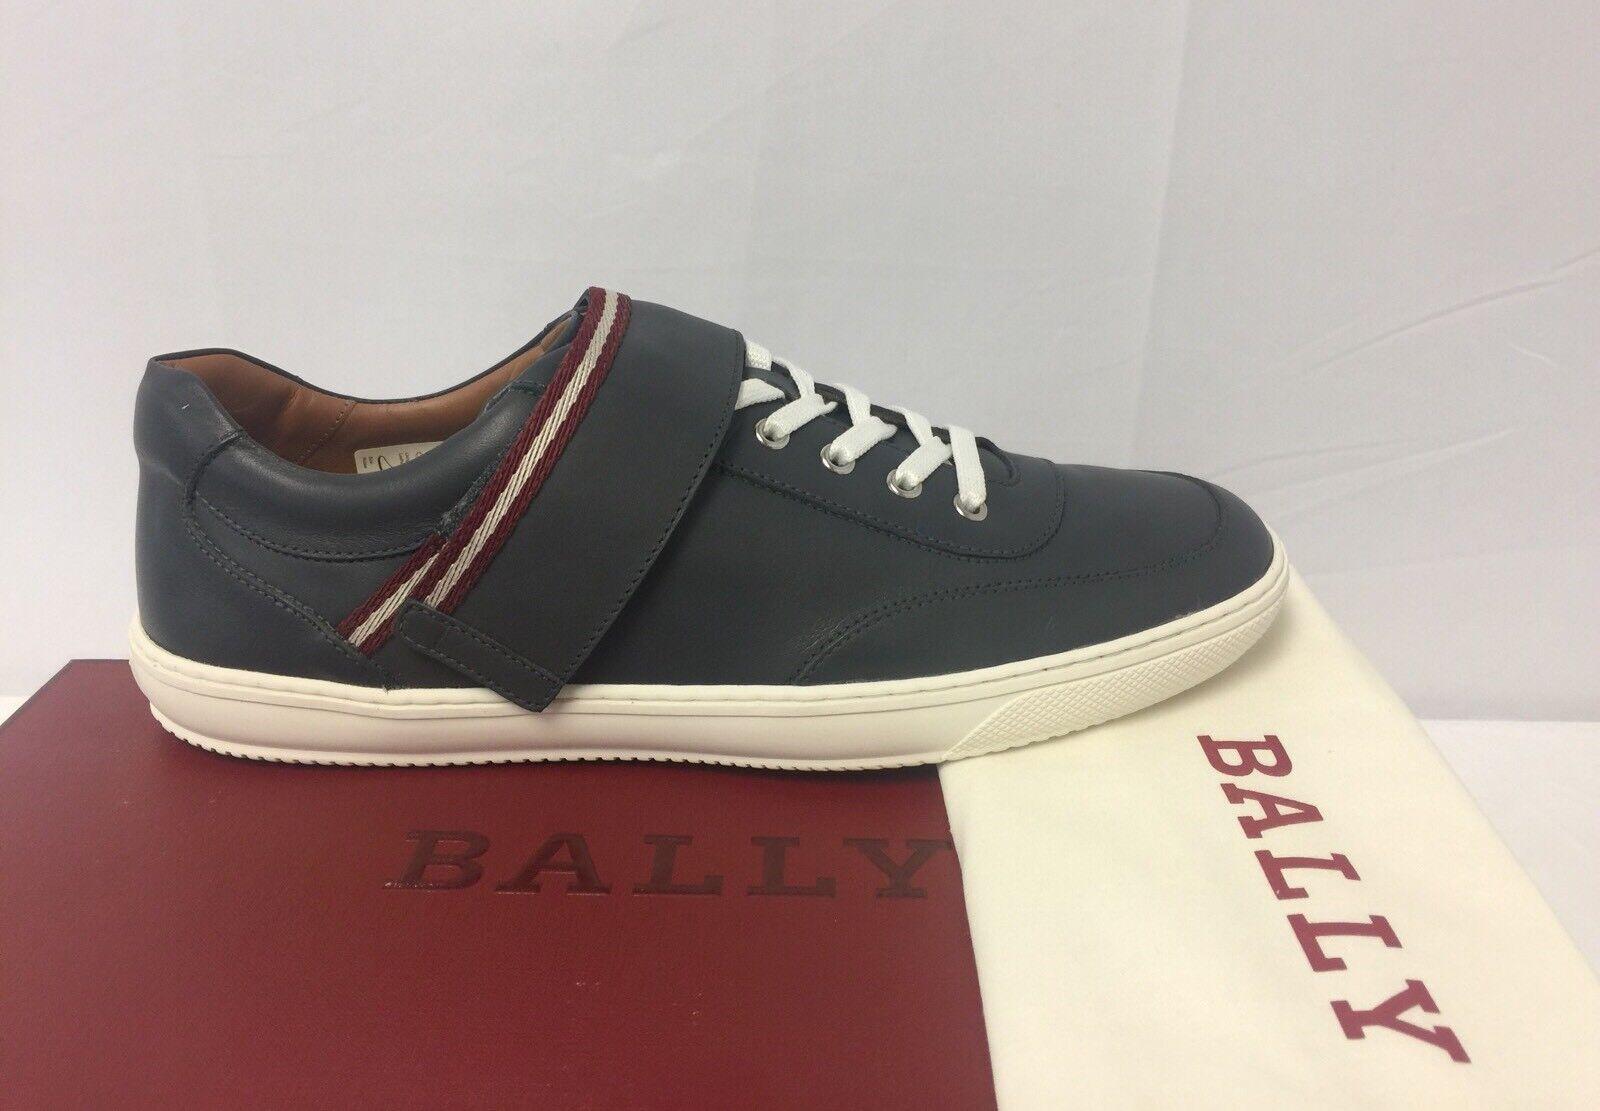 New In Box Bally 'Oasys' Dark Grey  Pelle Strap Low Top  Grey Sz 8/9  495.00 d4291f